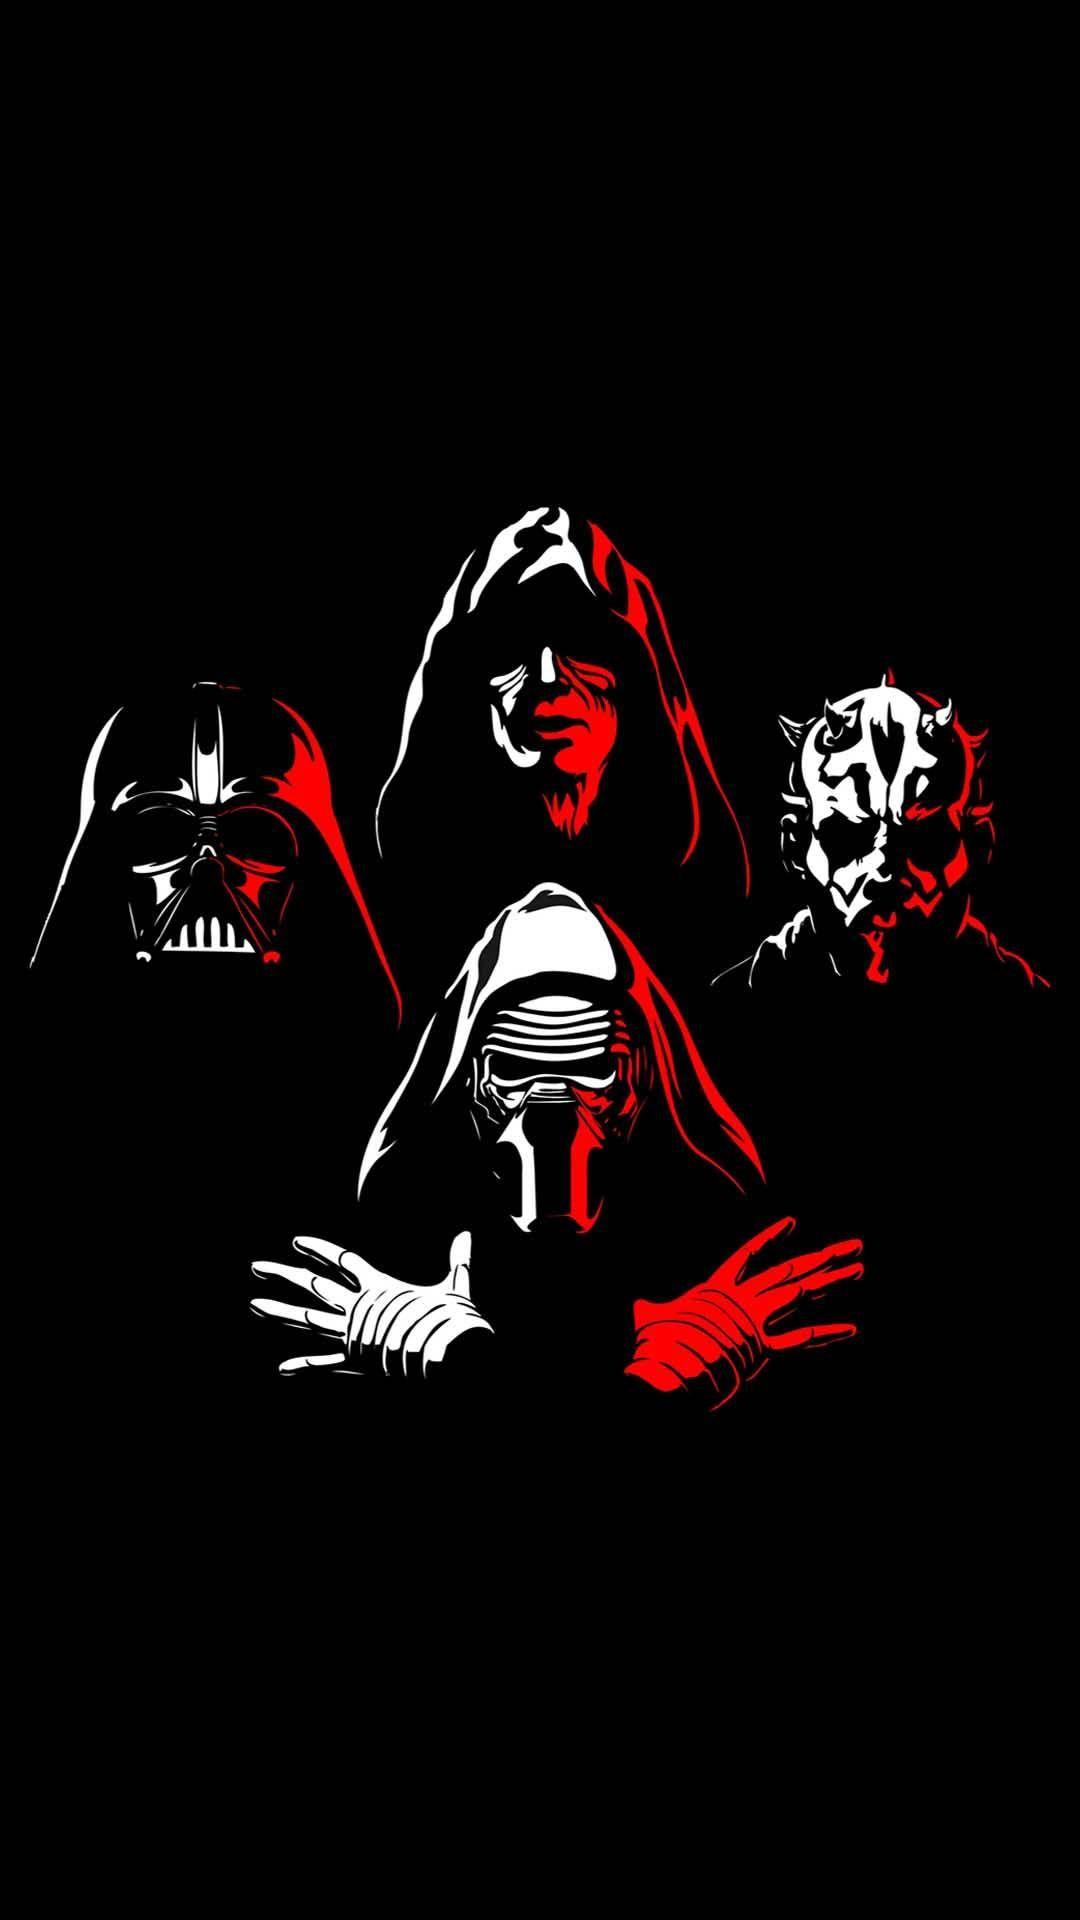 Star Wars Wallpaper Star Wars Wallpaper Star Wars Background Star Wars Images